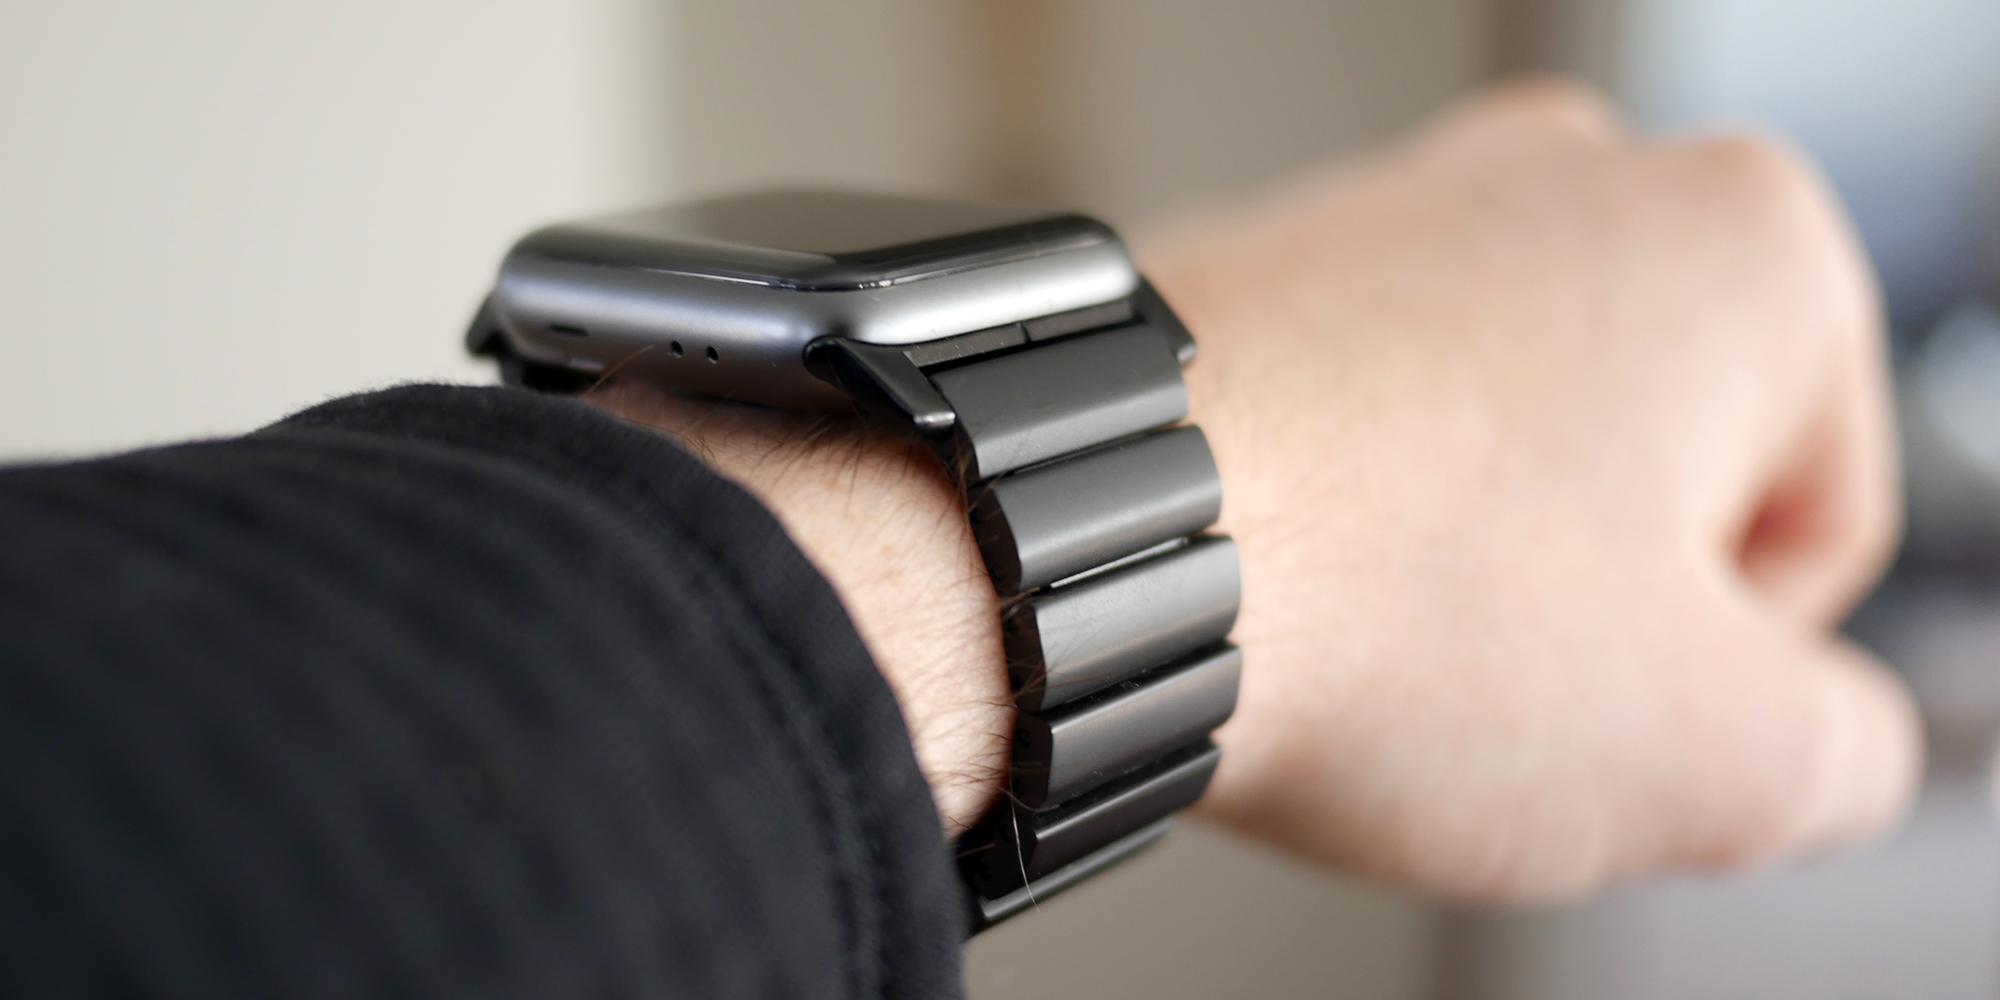 Nomad Titanium Apple Watch Band on wrist